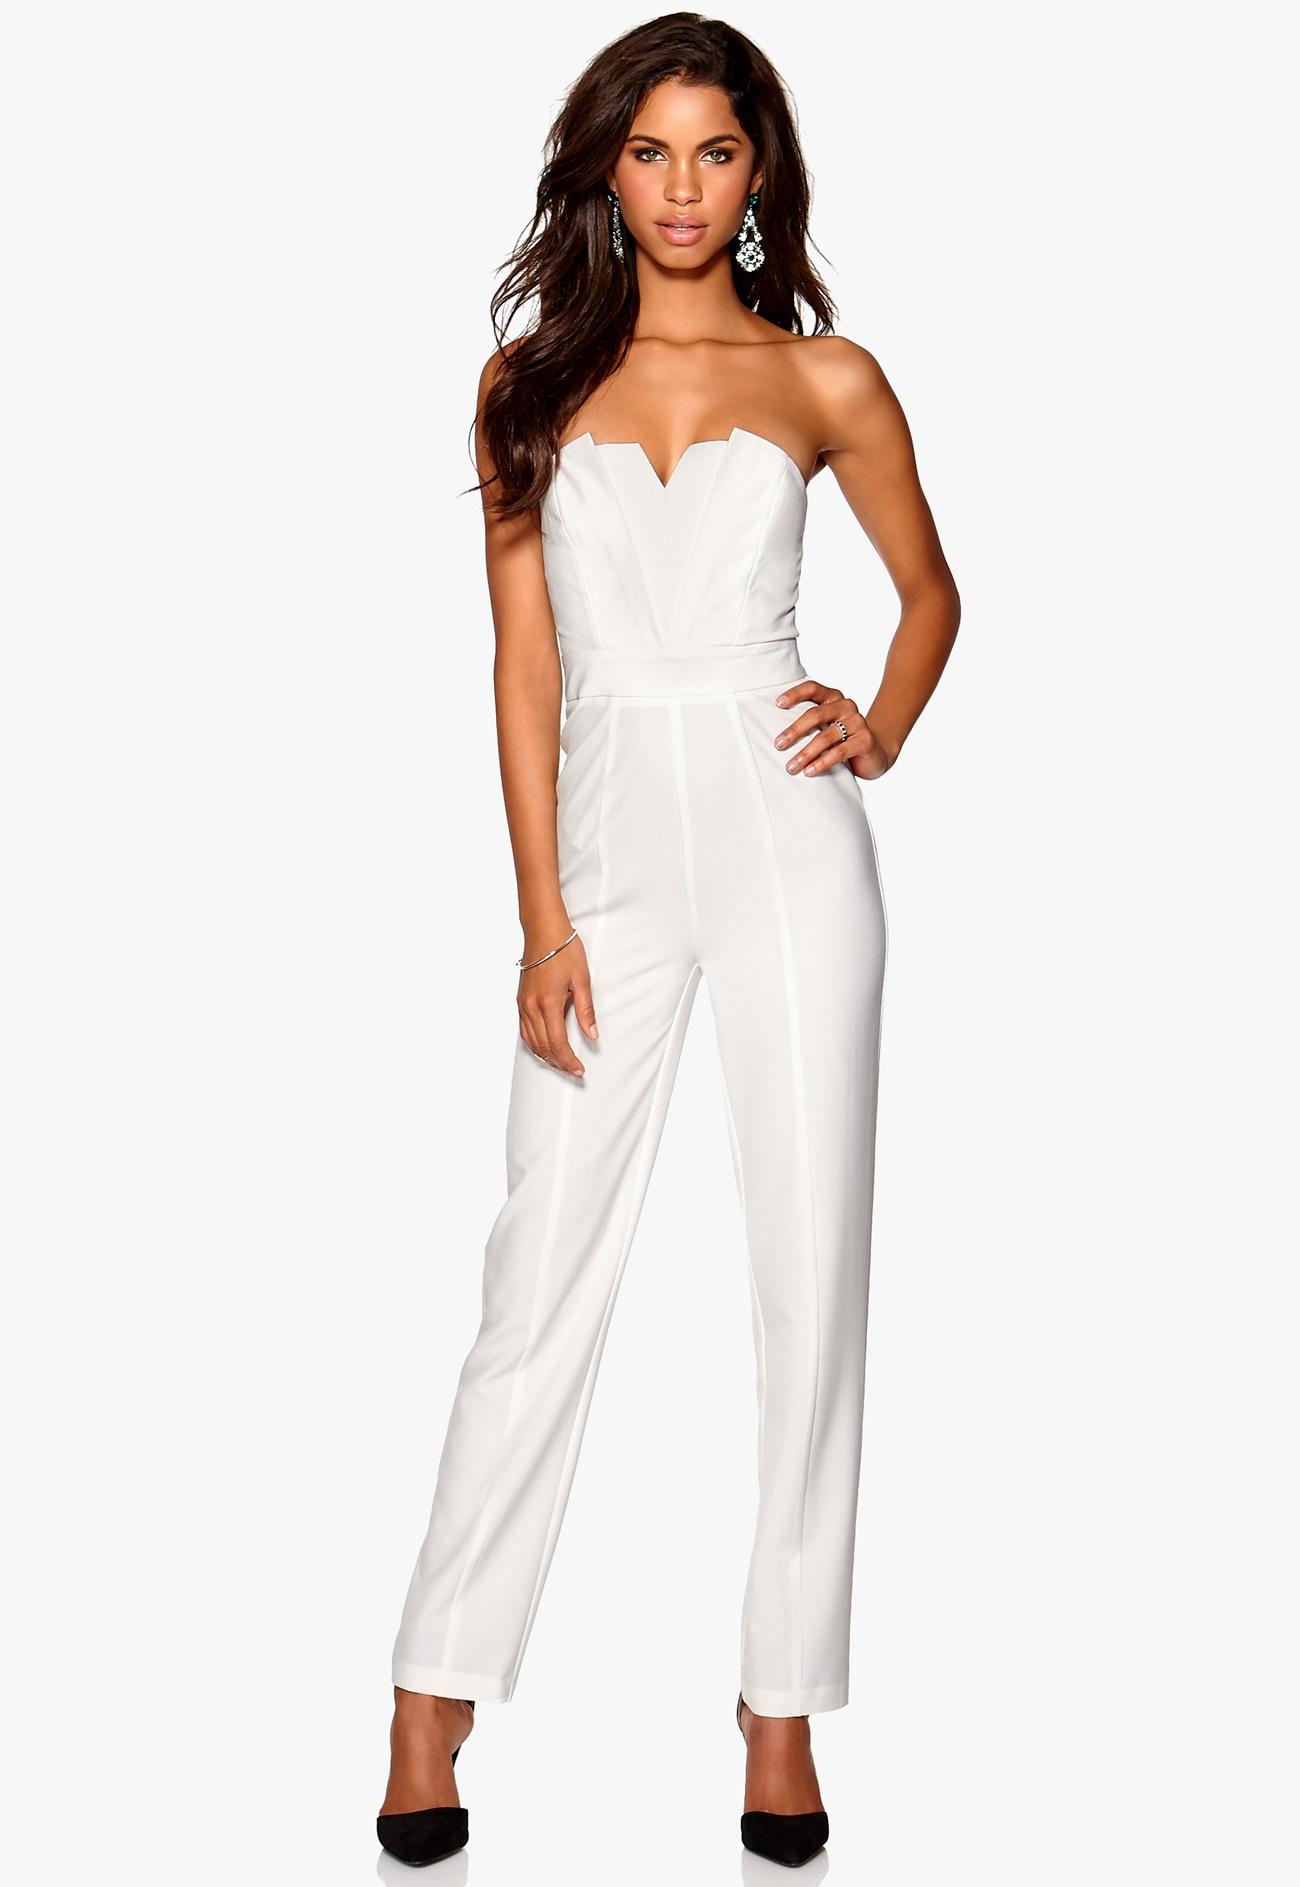 Make Way Langley Jumpsuit White